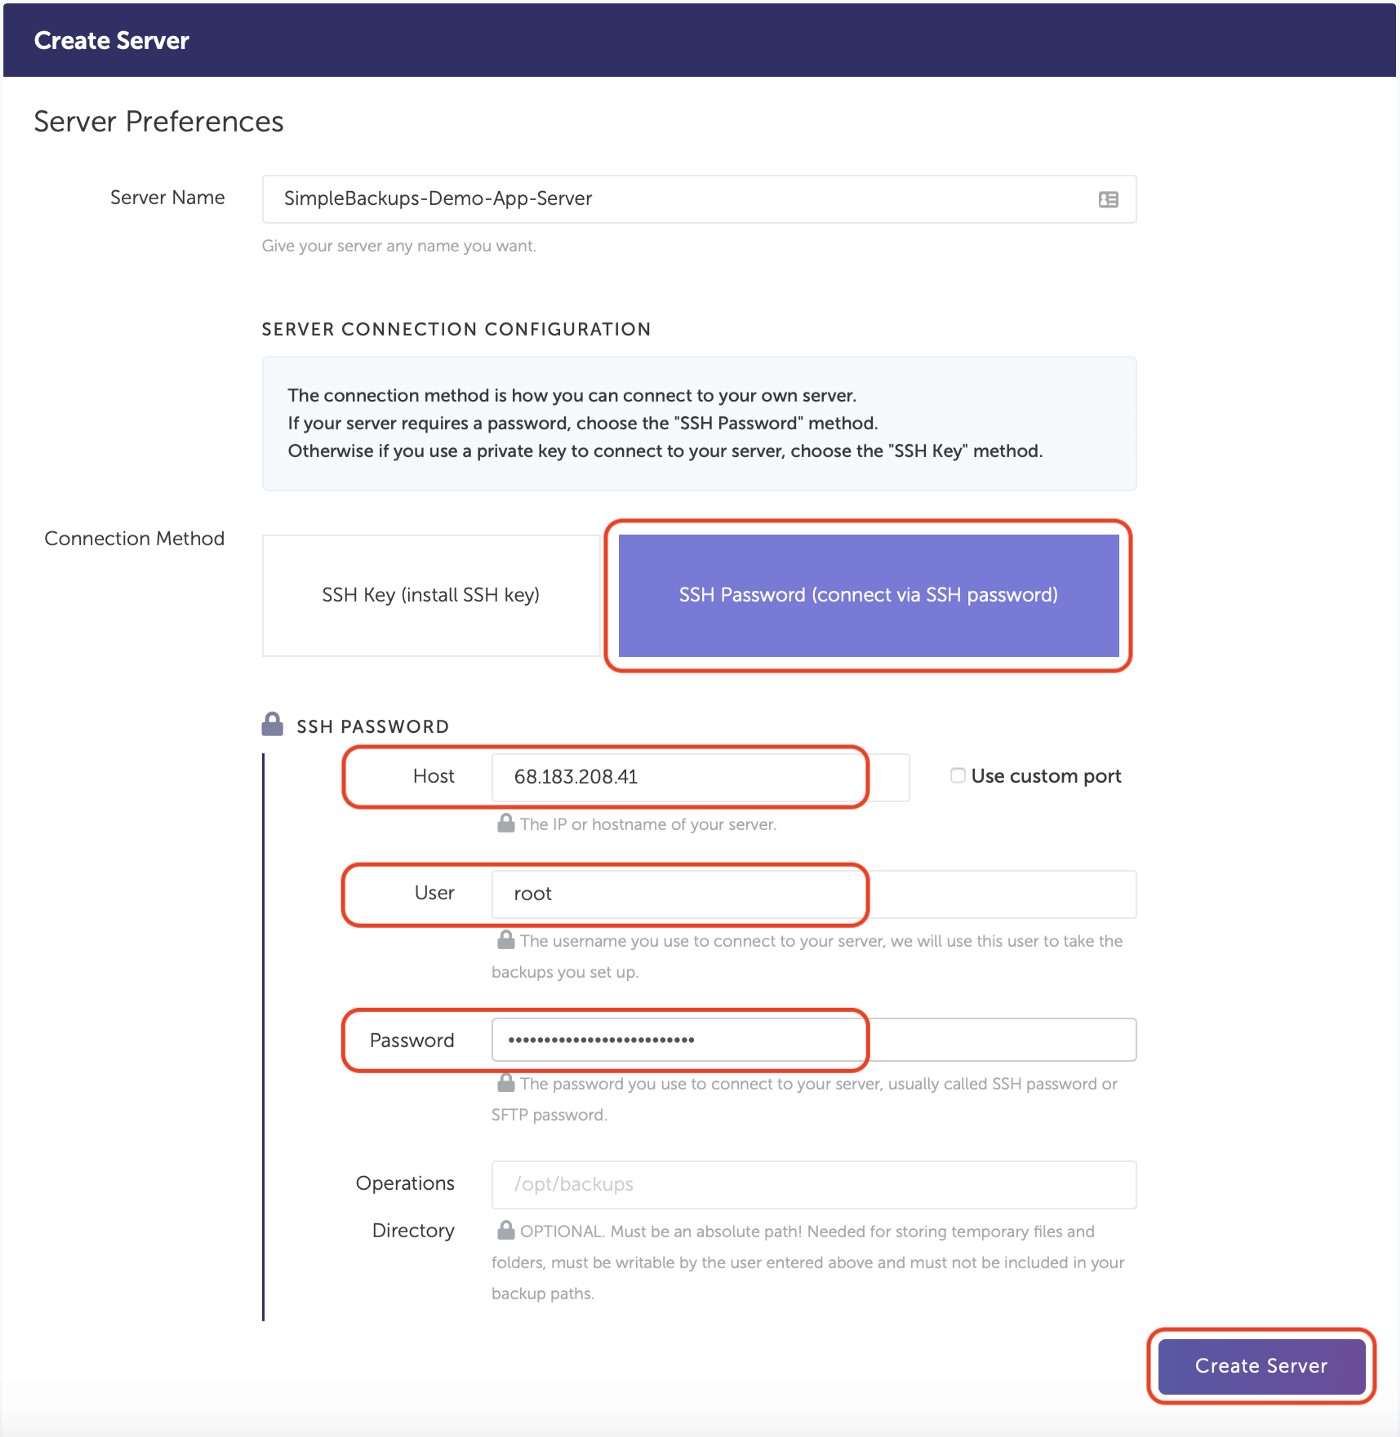 SimpleBackups - Add Credentials